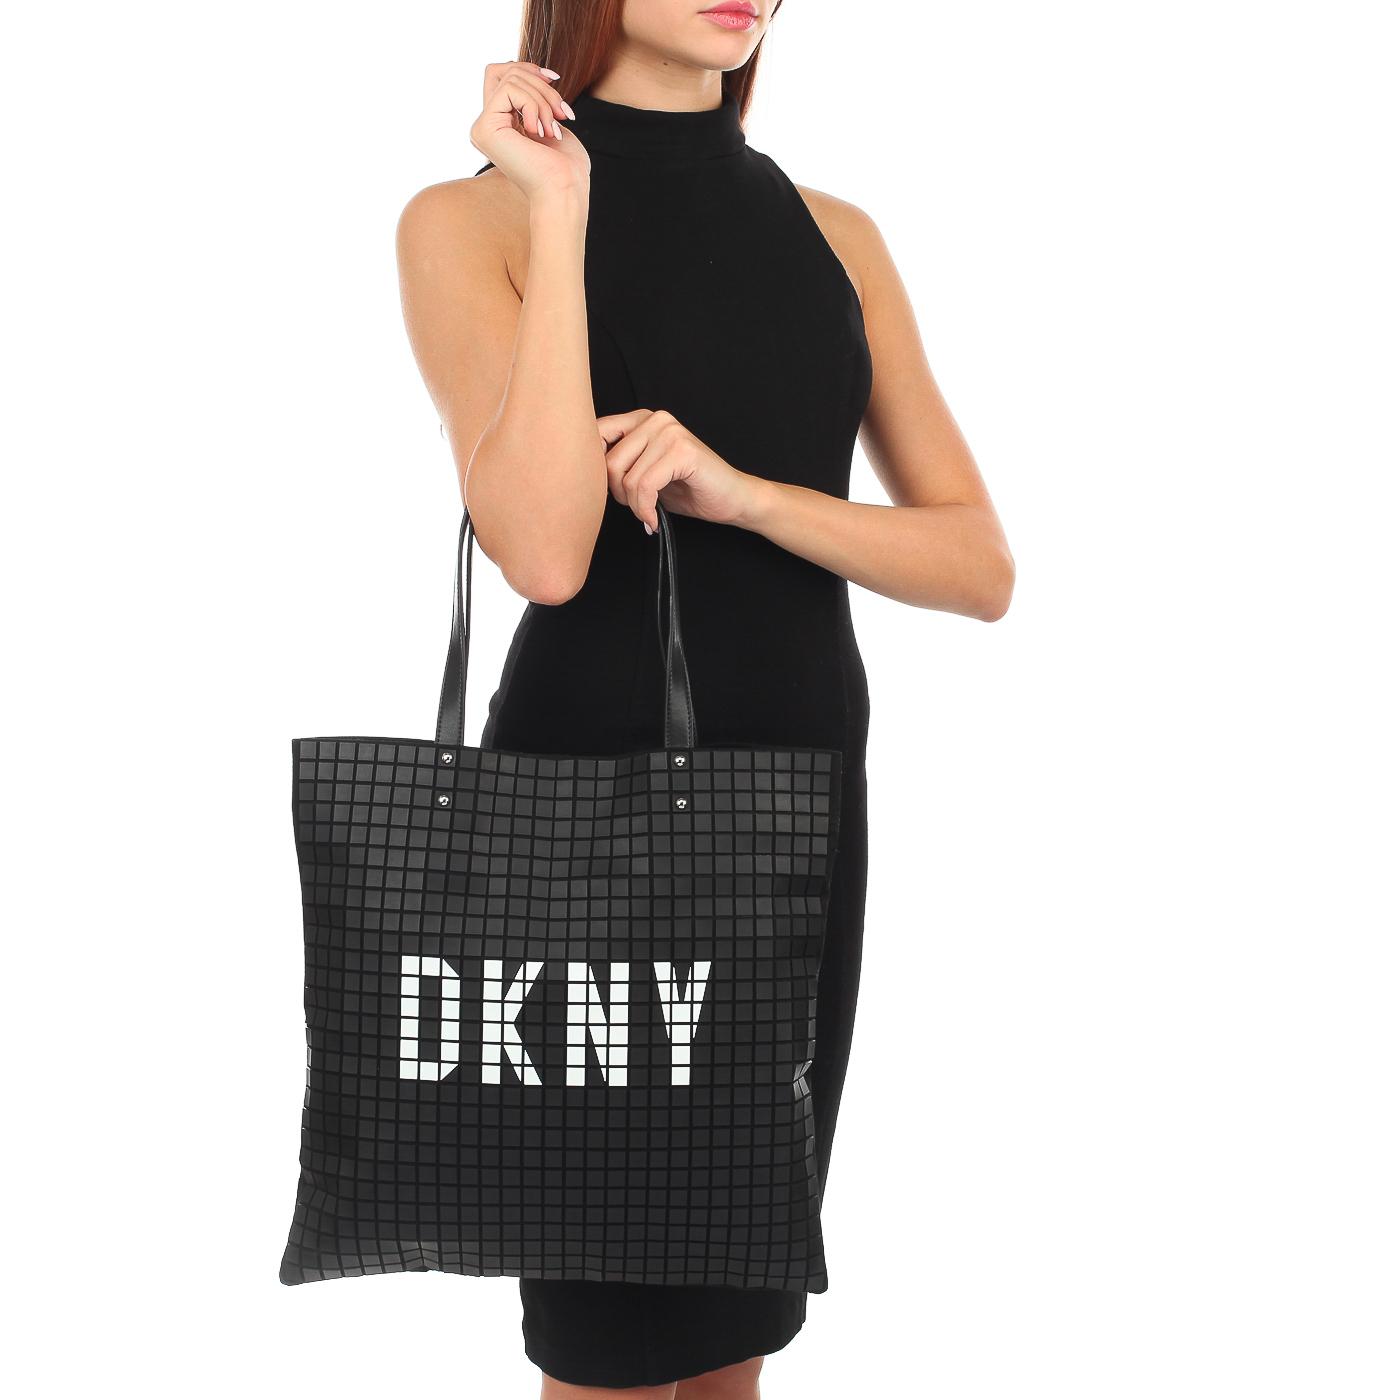 342c9a6d6b87 Кожаная сумка с длинными ручками DKNY St. Marks R83BZ699-BLW ...